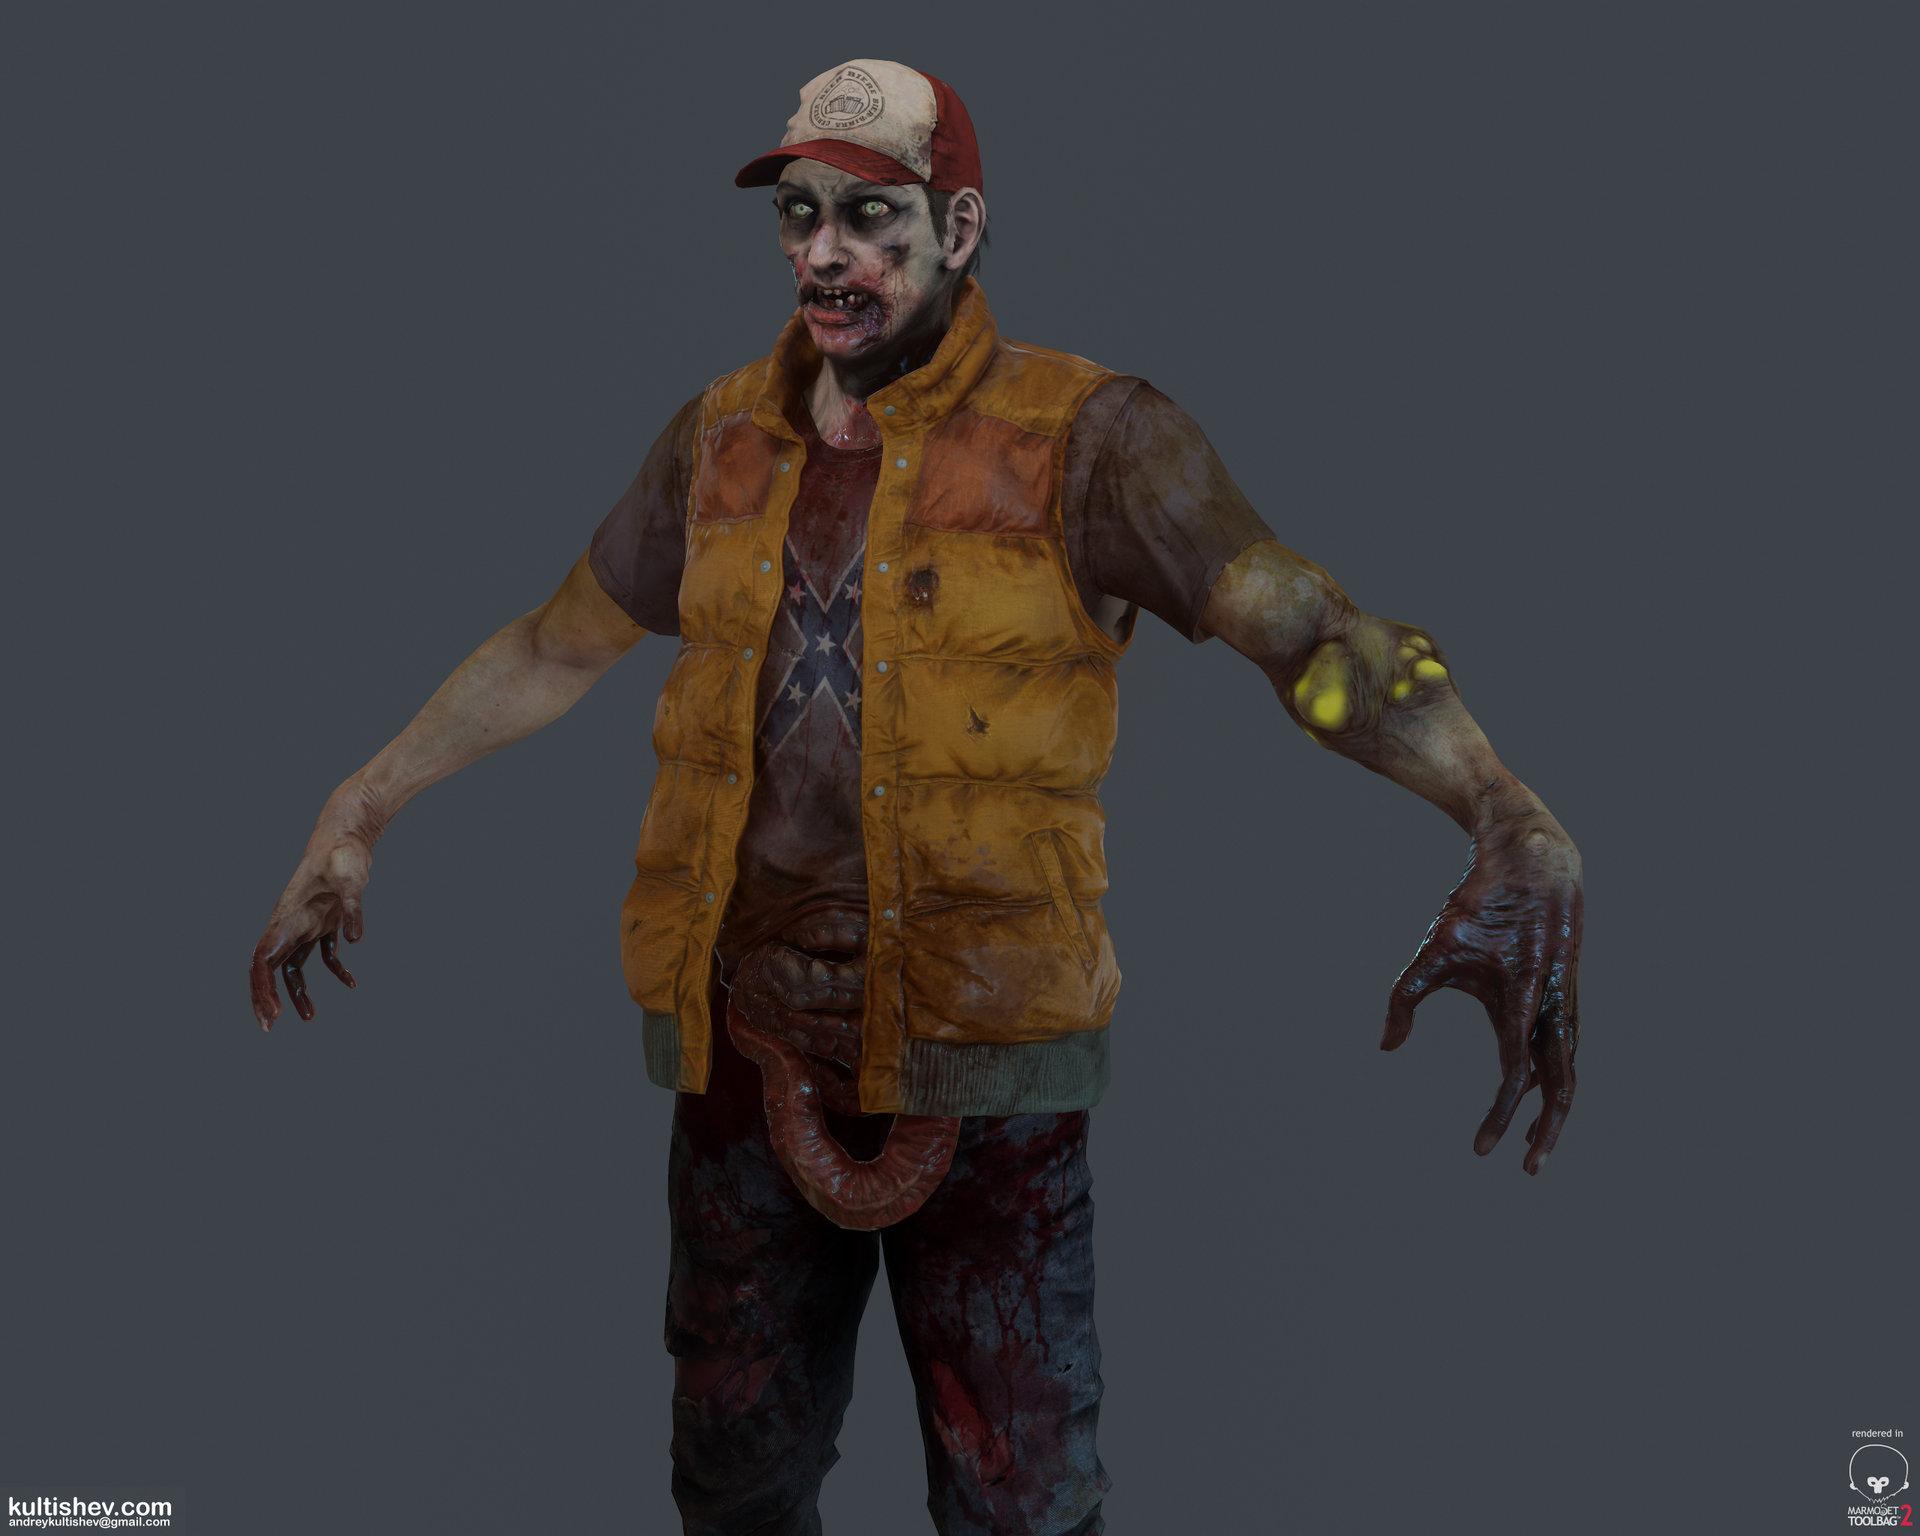 Andrey kultishev kultishev zombie lp02